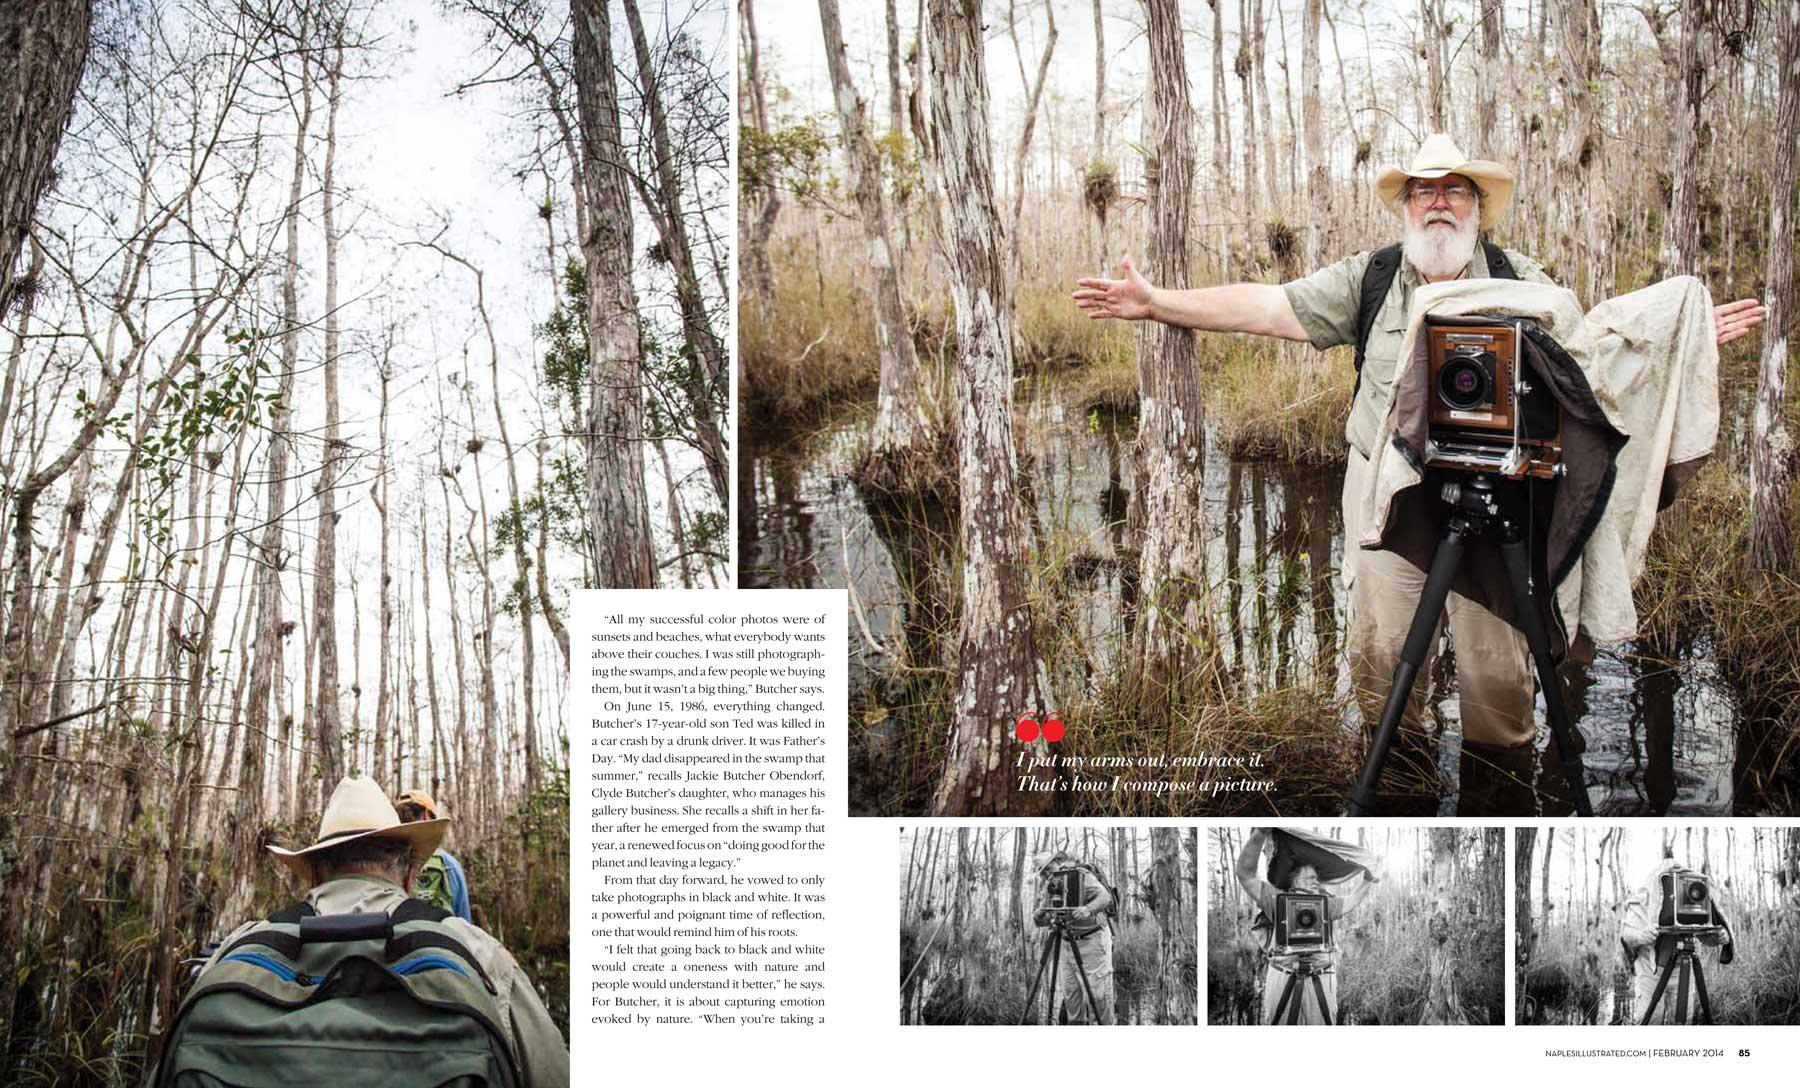 Clyde Butcher, Corkscrew Swamp Sanctuary, Everglades. Copyright 2013 Vanessa Rogers Photography